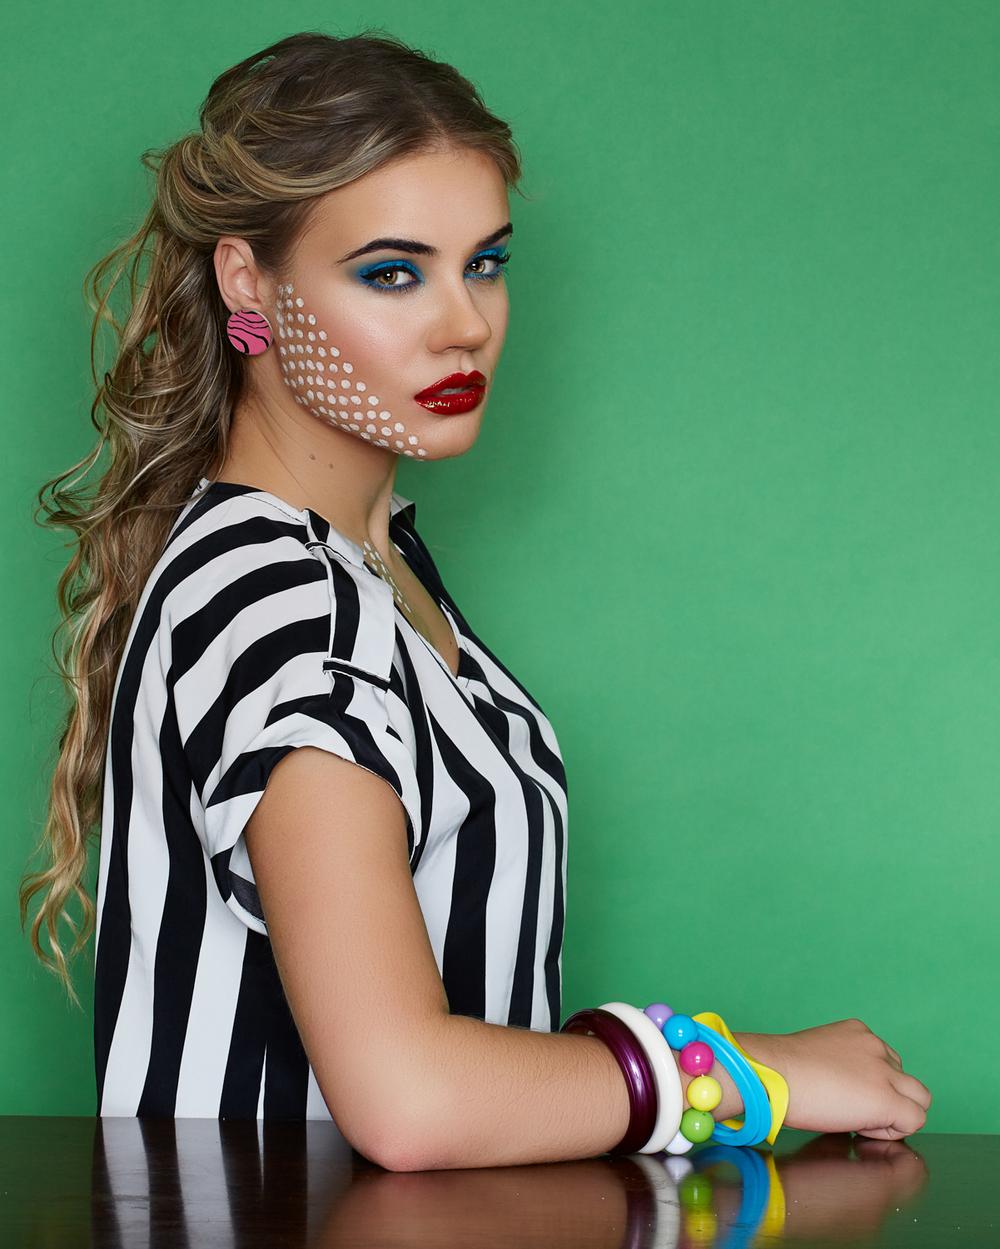 K14_2775-150-Kamal Mostofi-Beauty_ZyZi Makeup_Elvina_80s.jpg